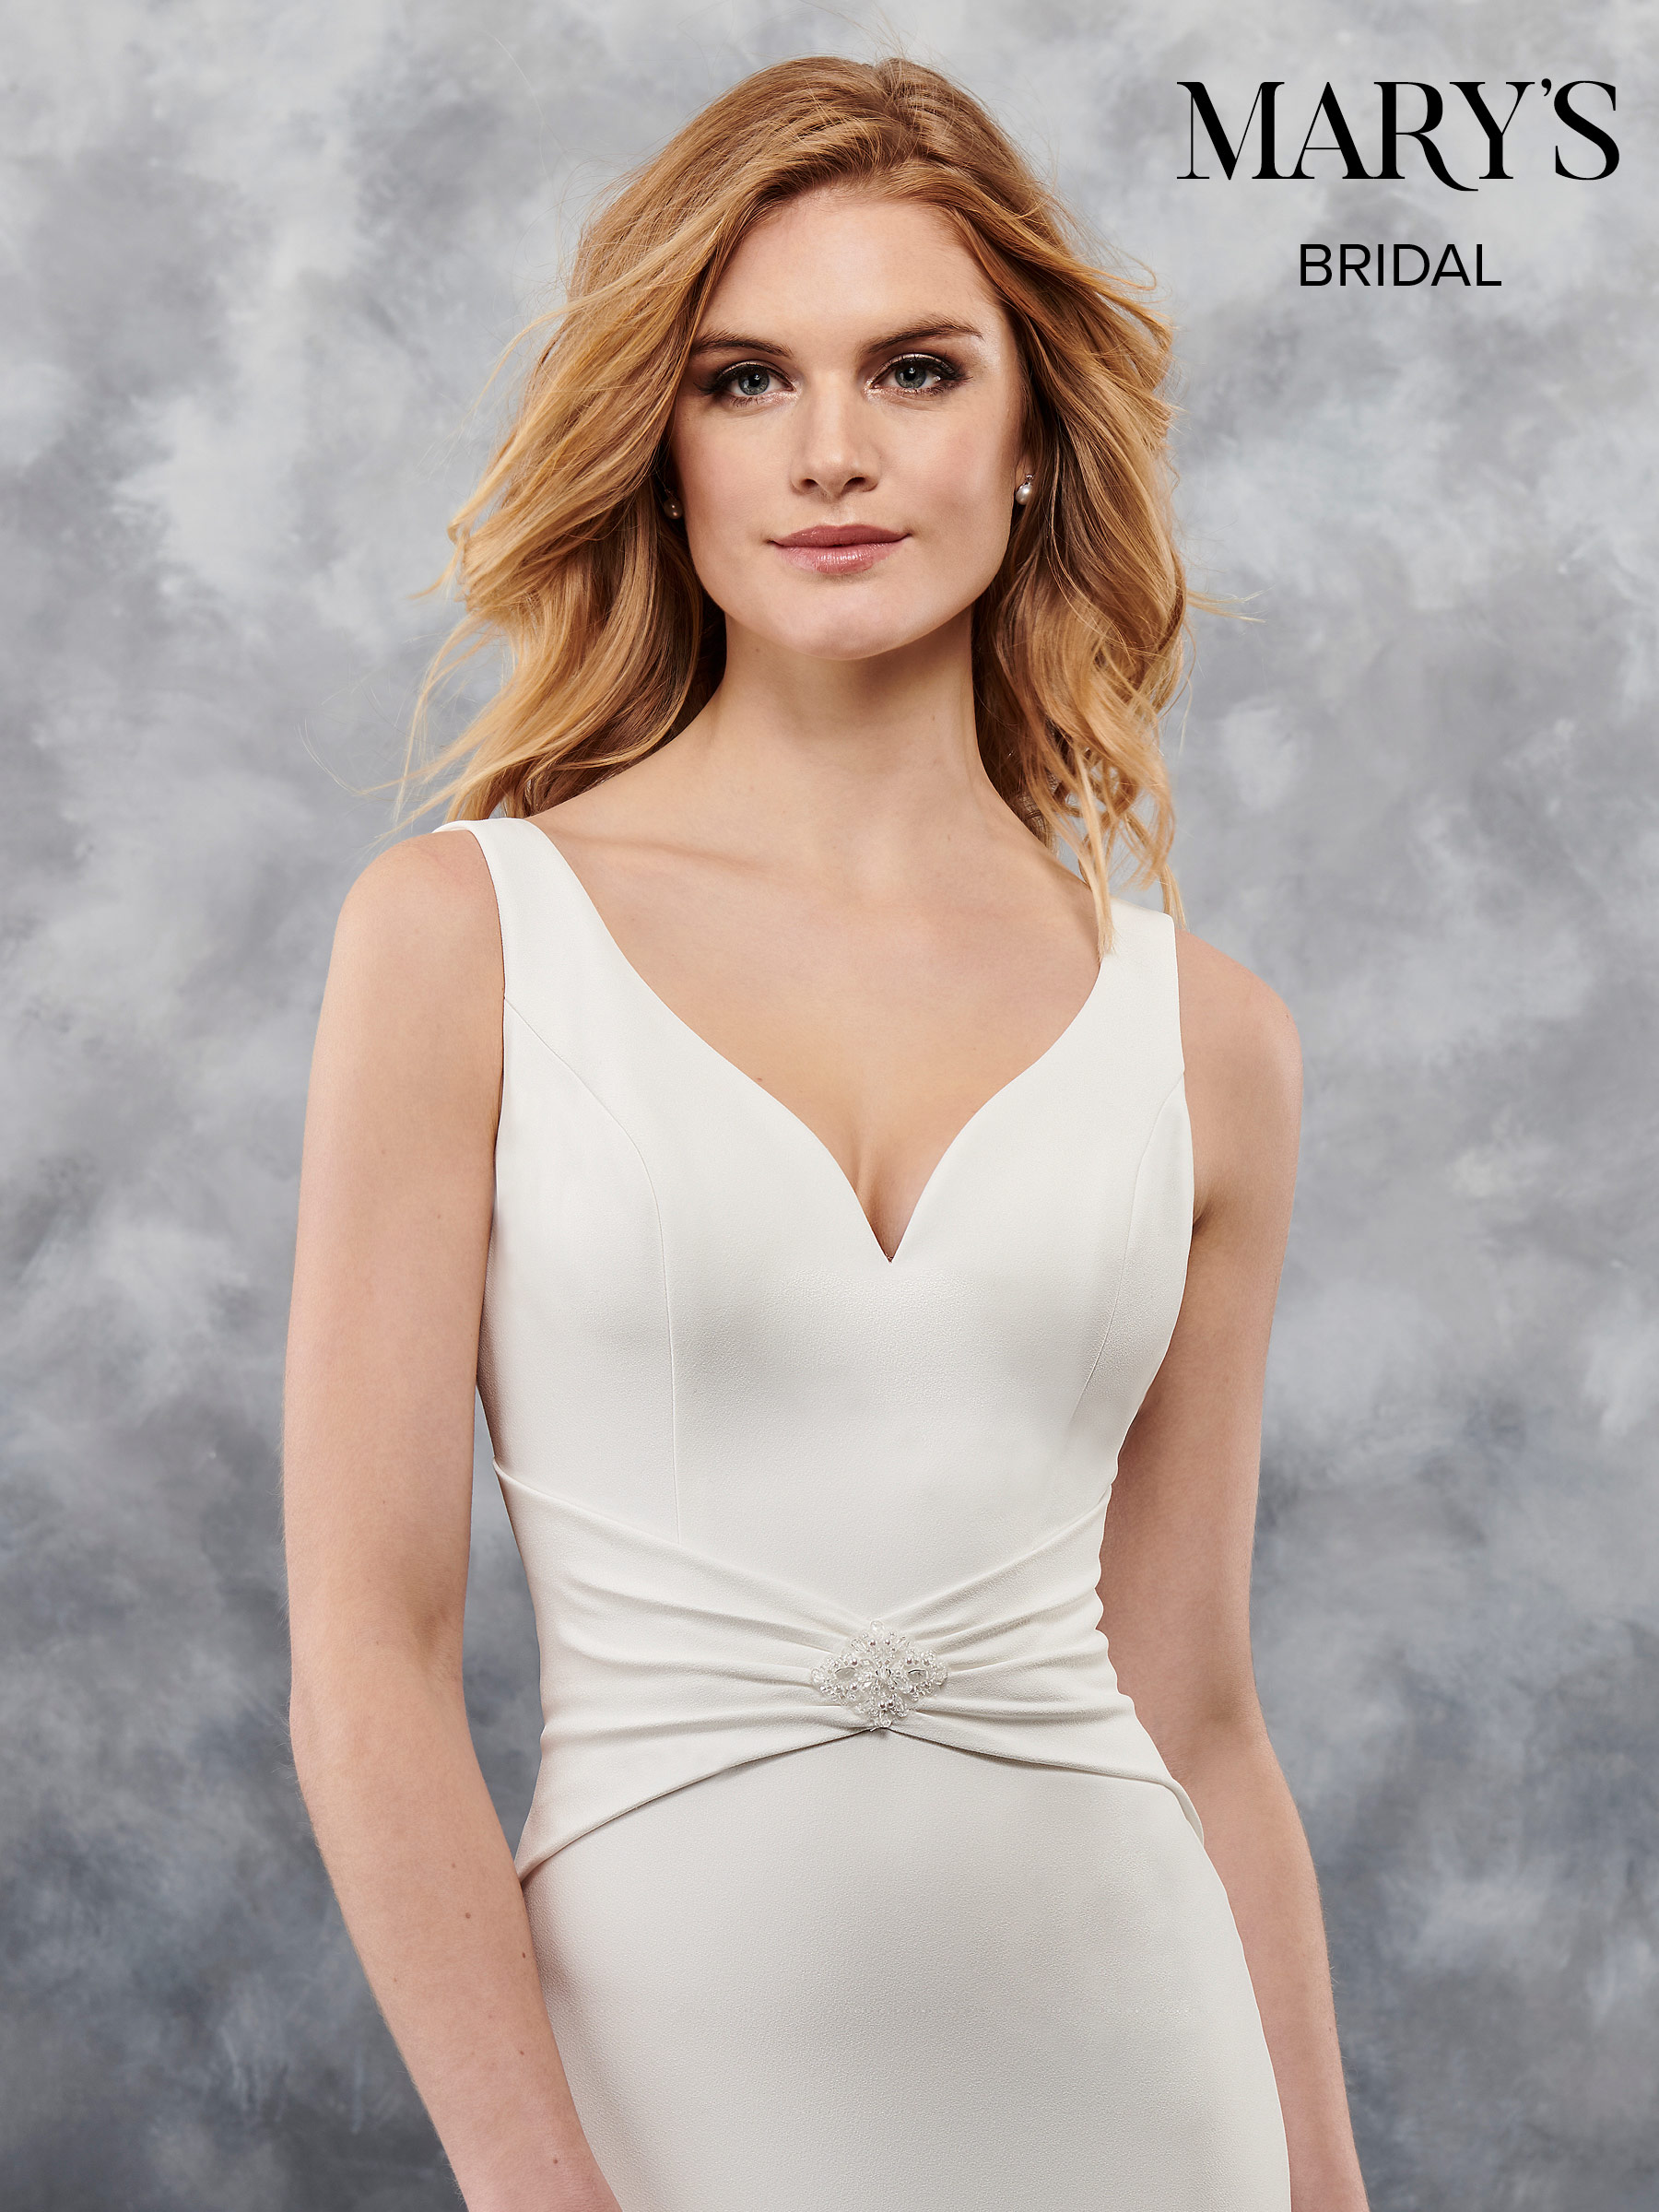 Bridal Wedding Dresses | Mary's | Style - MB1021